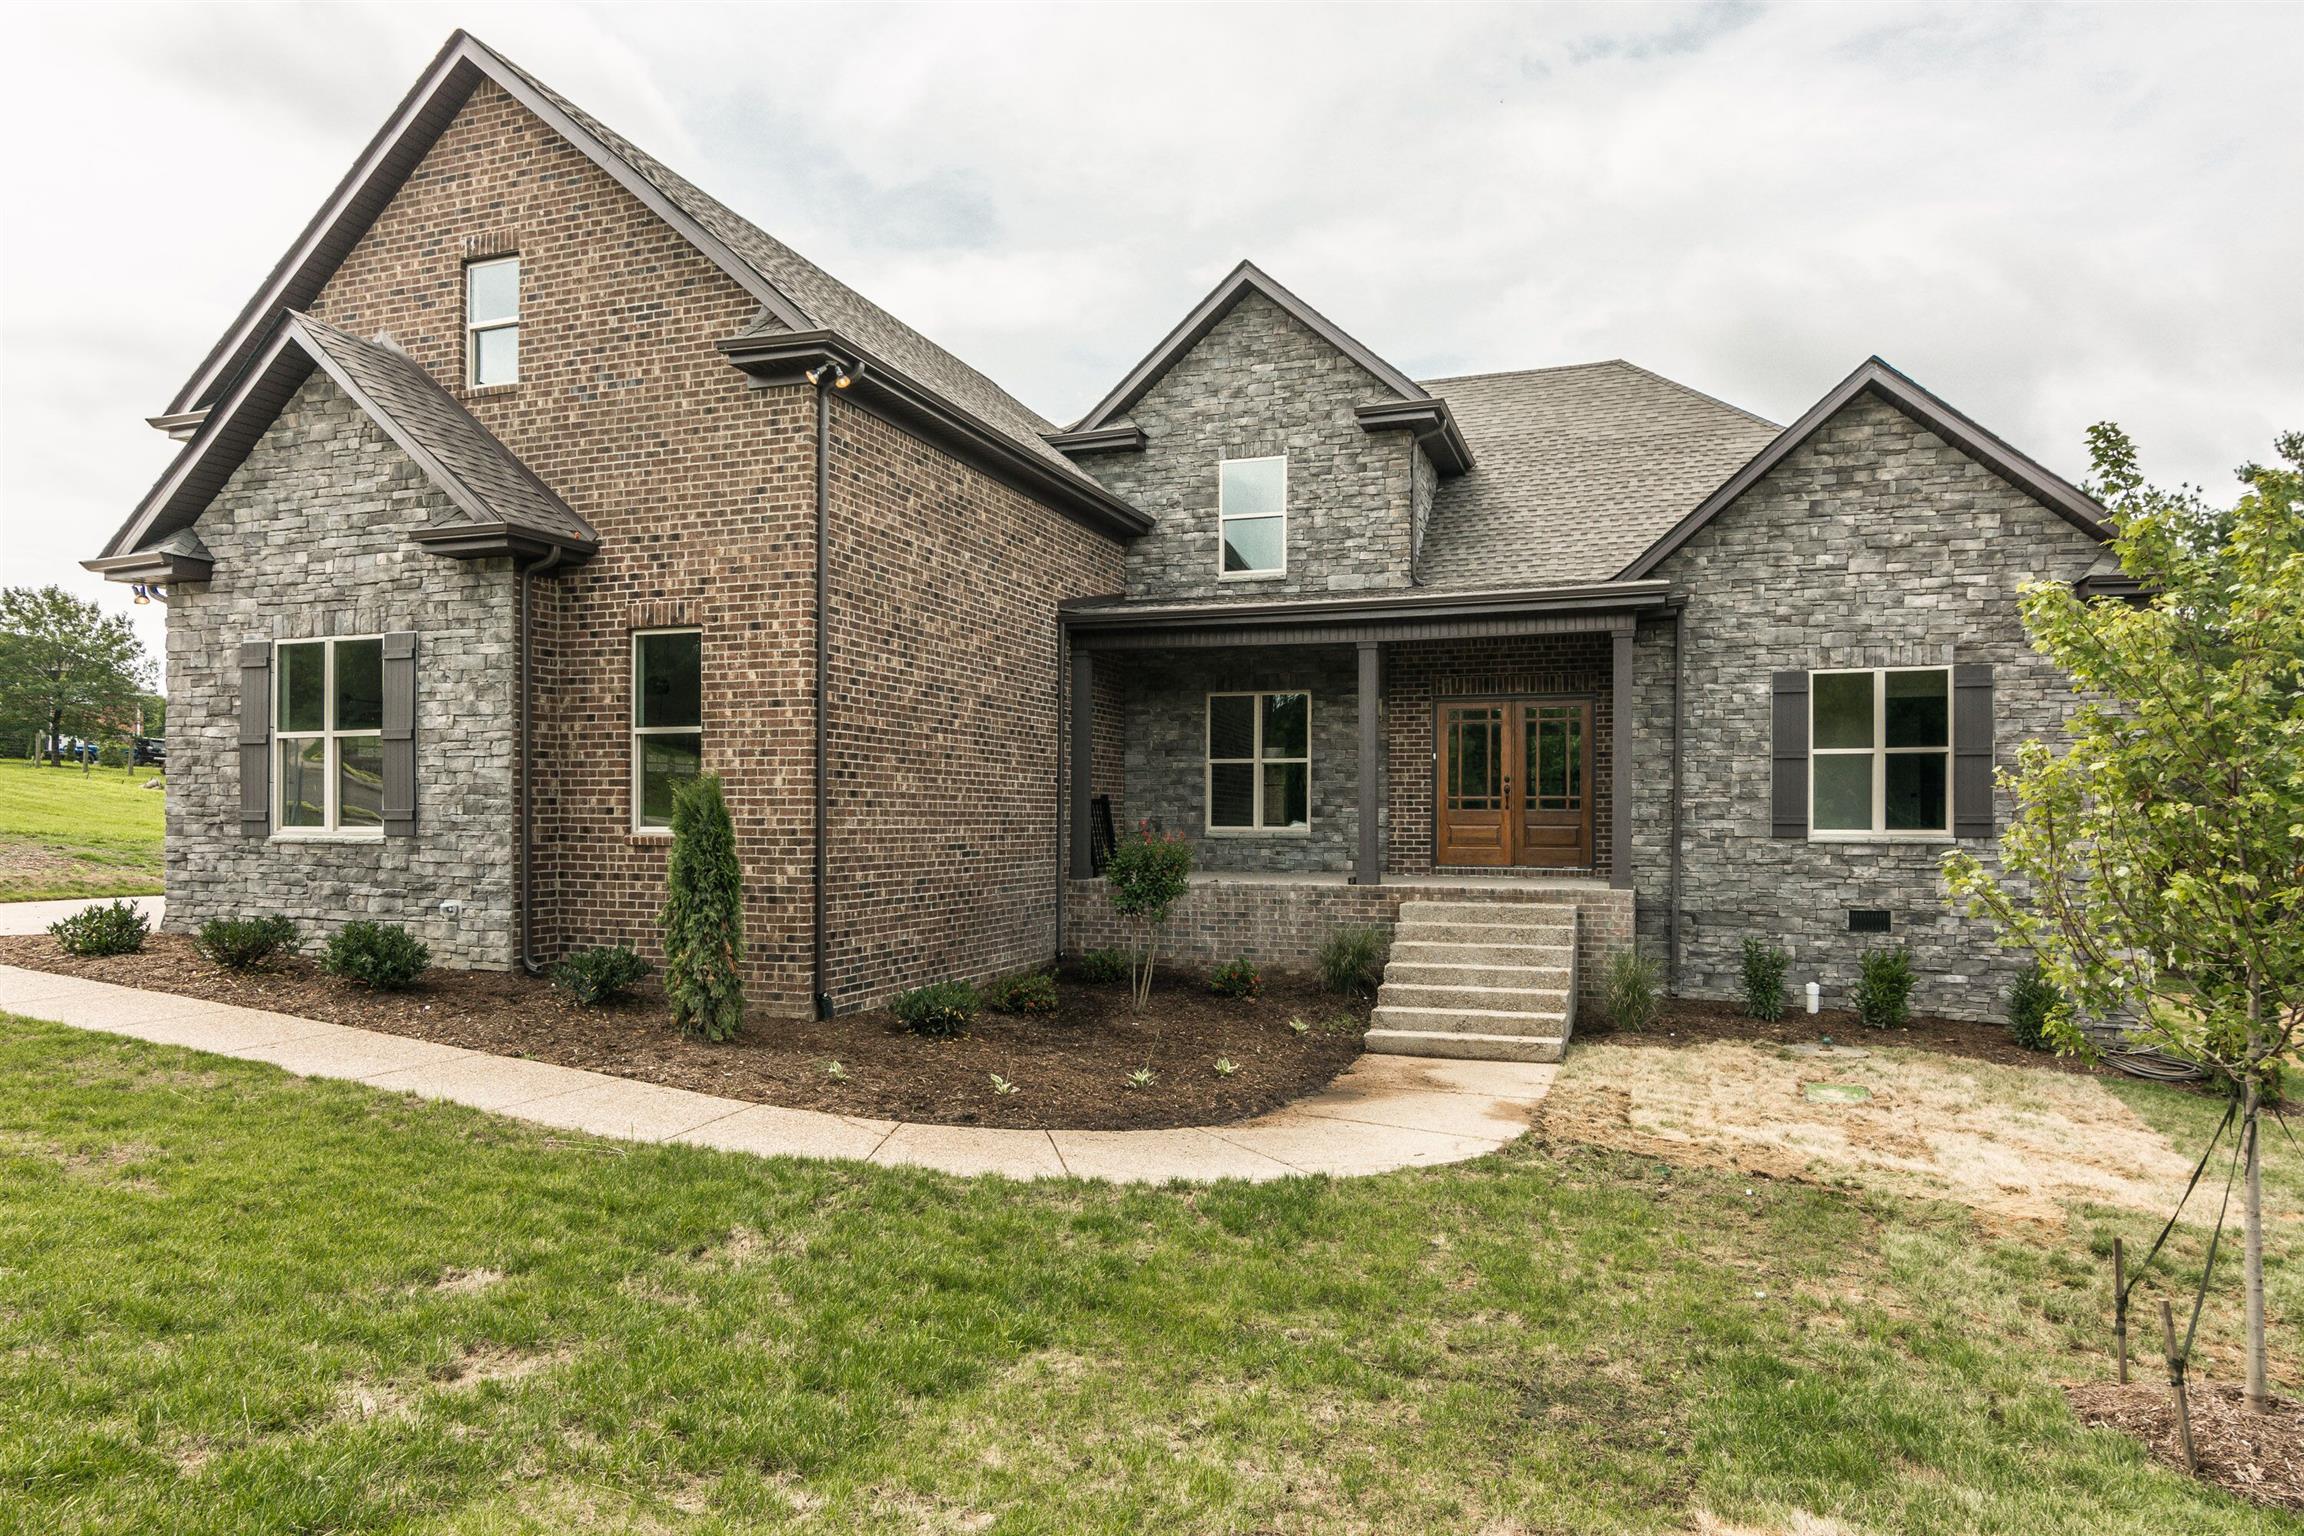 2010 Eagle View Rd, Hendersonville, TN 37075 - Hendersonville, TN real estate listing